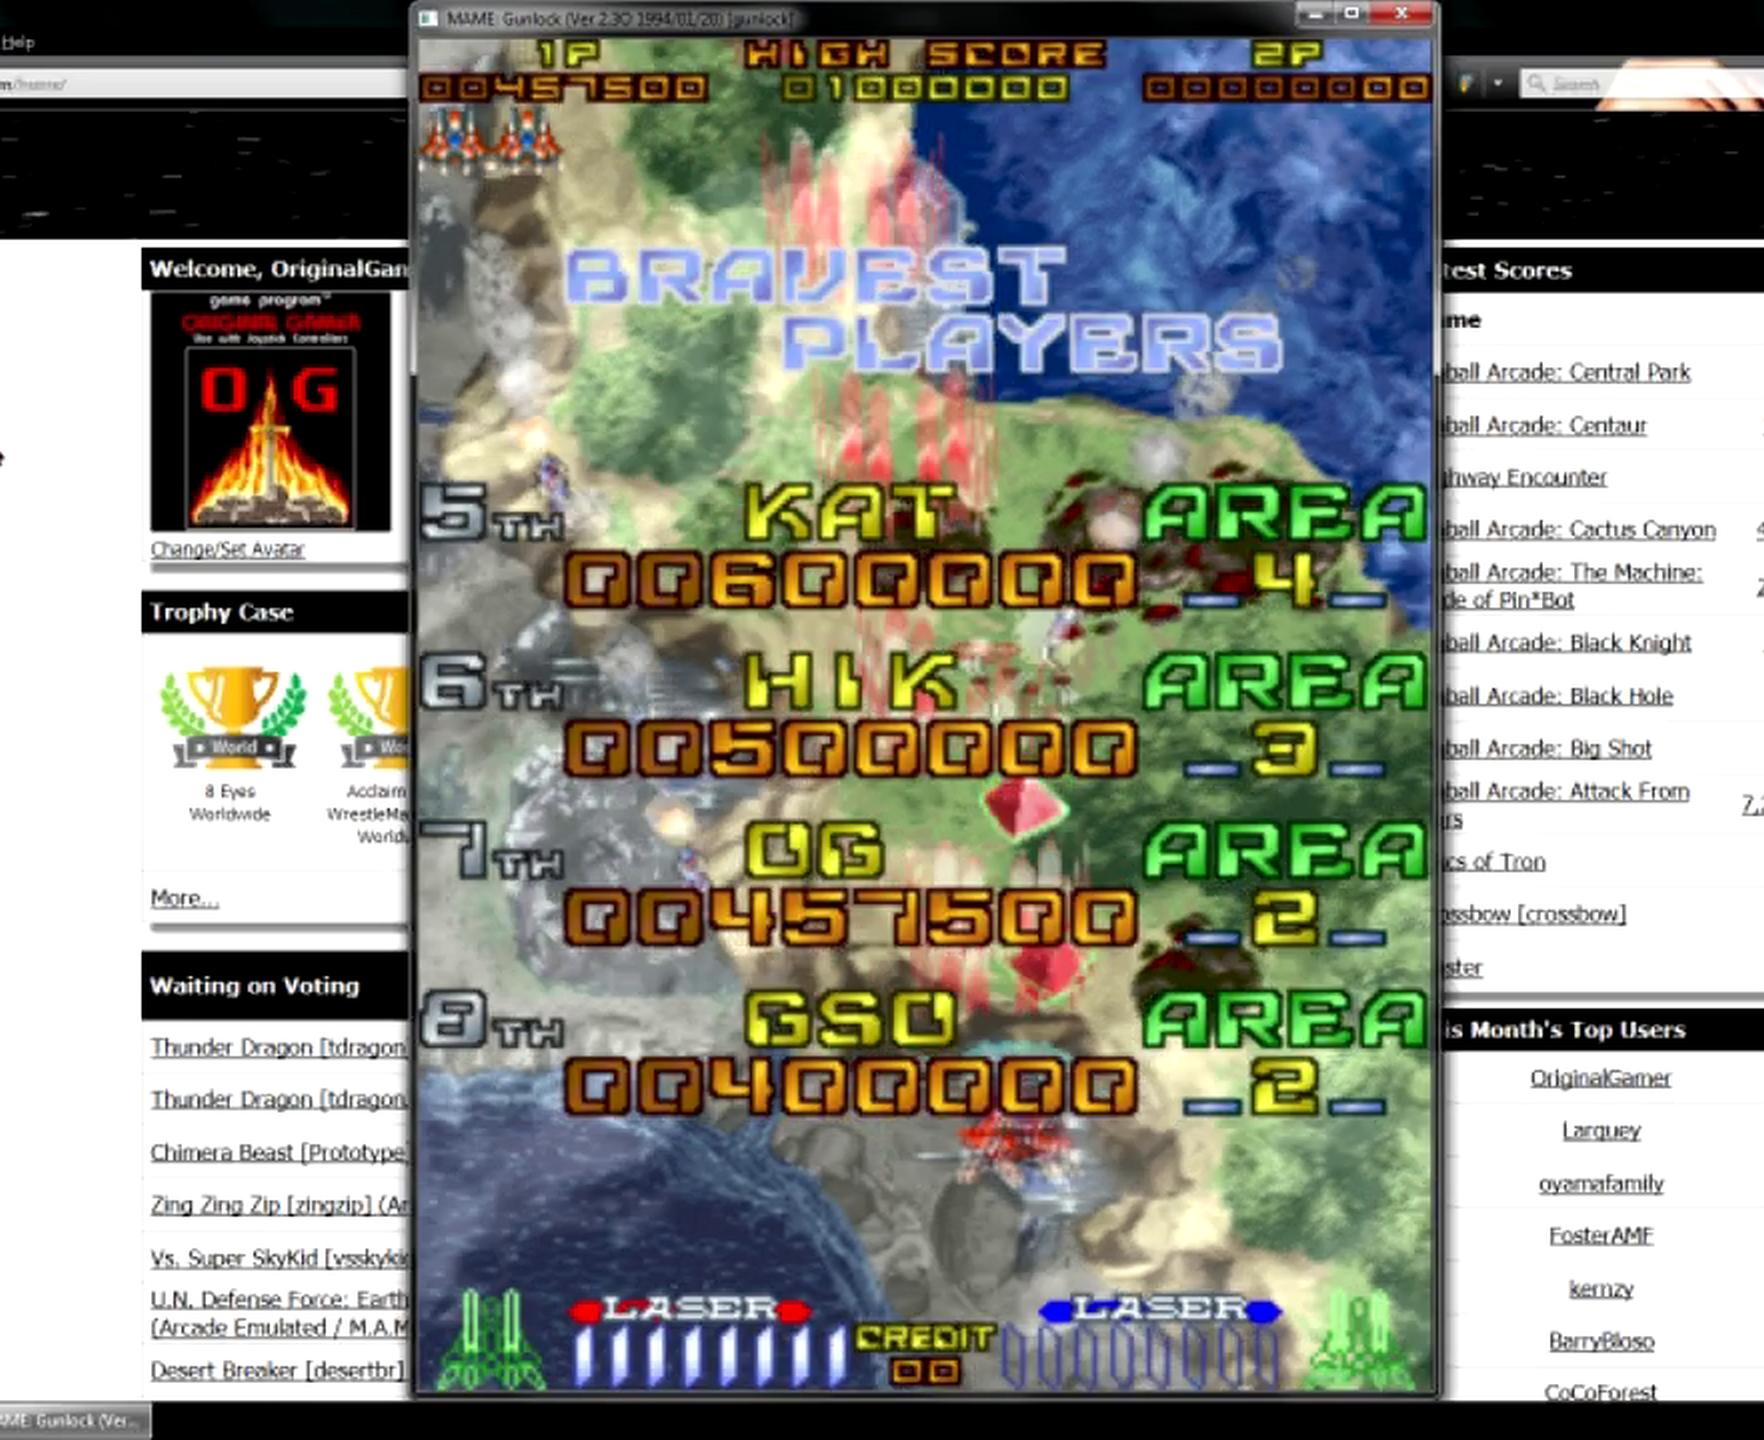 OriginalGamer: Gunlock [gunlock] (Arcade Emulated / M.A.M.E.) 457,500 points on 2015-05-27 20:13:21